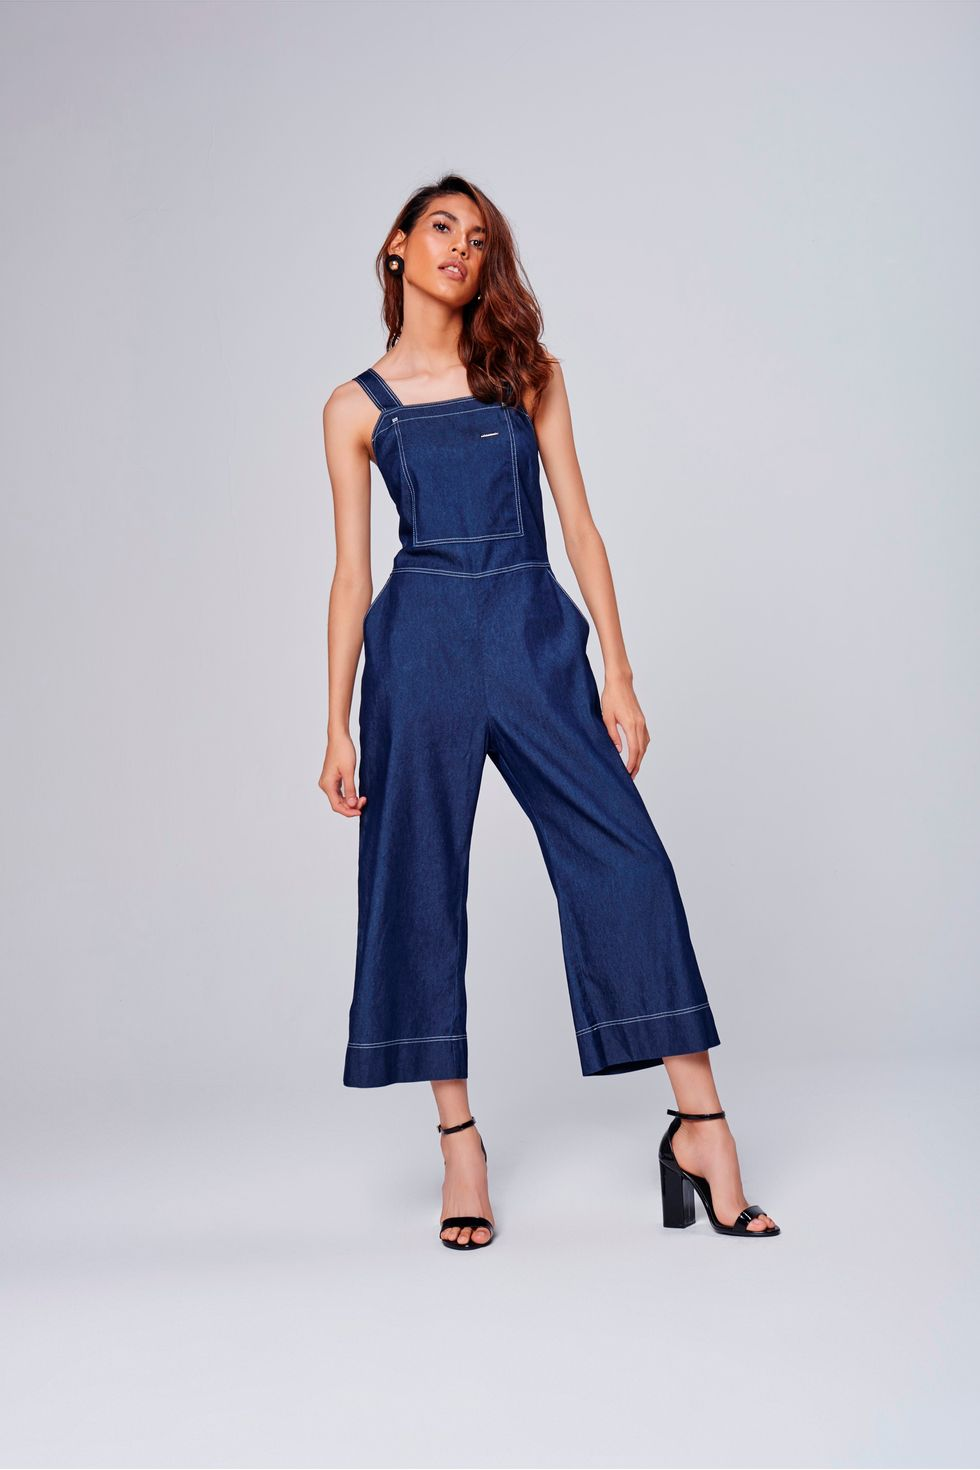 Macacao-Jeans-Cropped-Feminino-Frente--